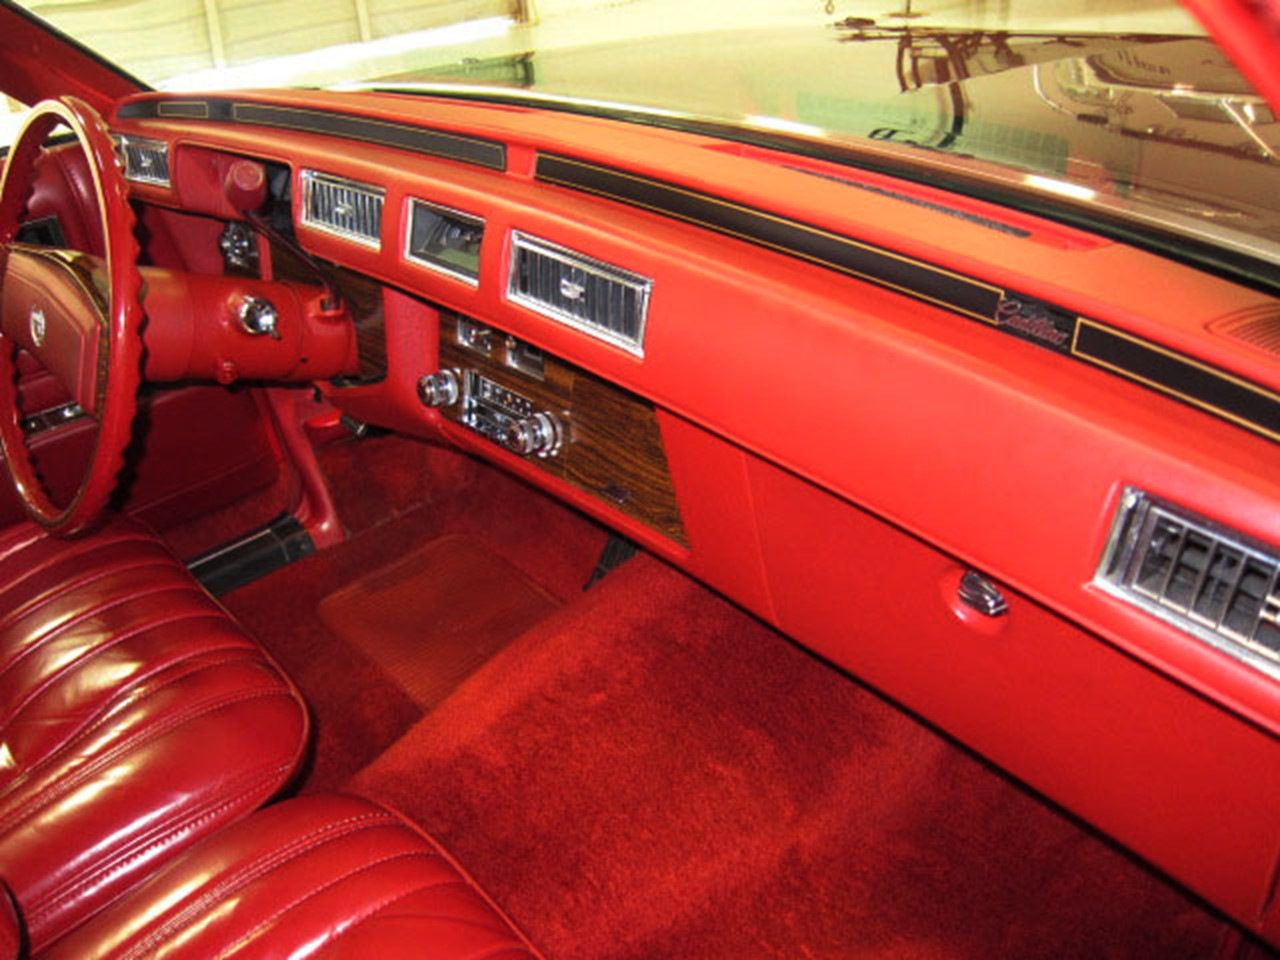 Fresh Metal 1978 Cadillac Seville Notoriousluxury Sedan Deville 4 Door 35 12 52 53 The